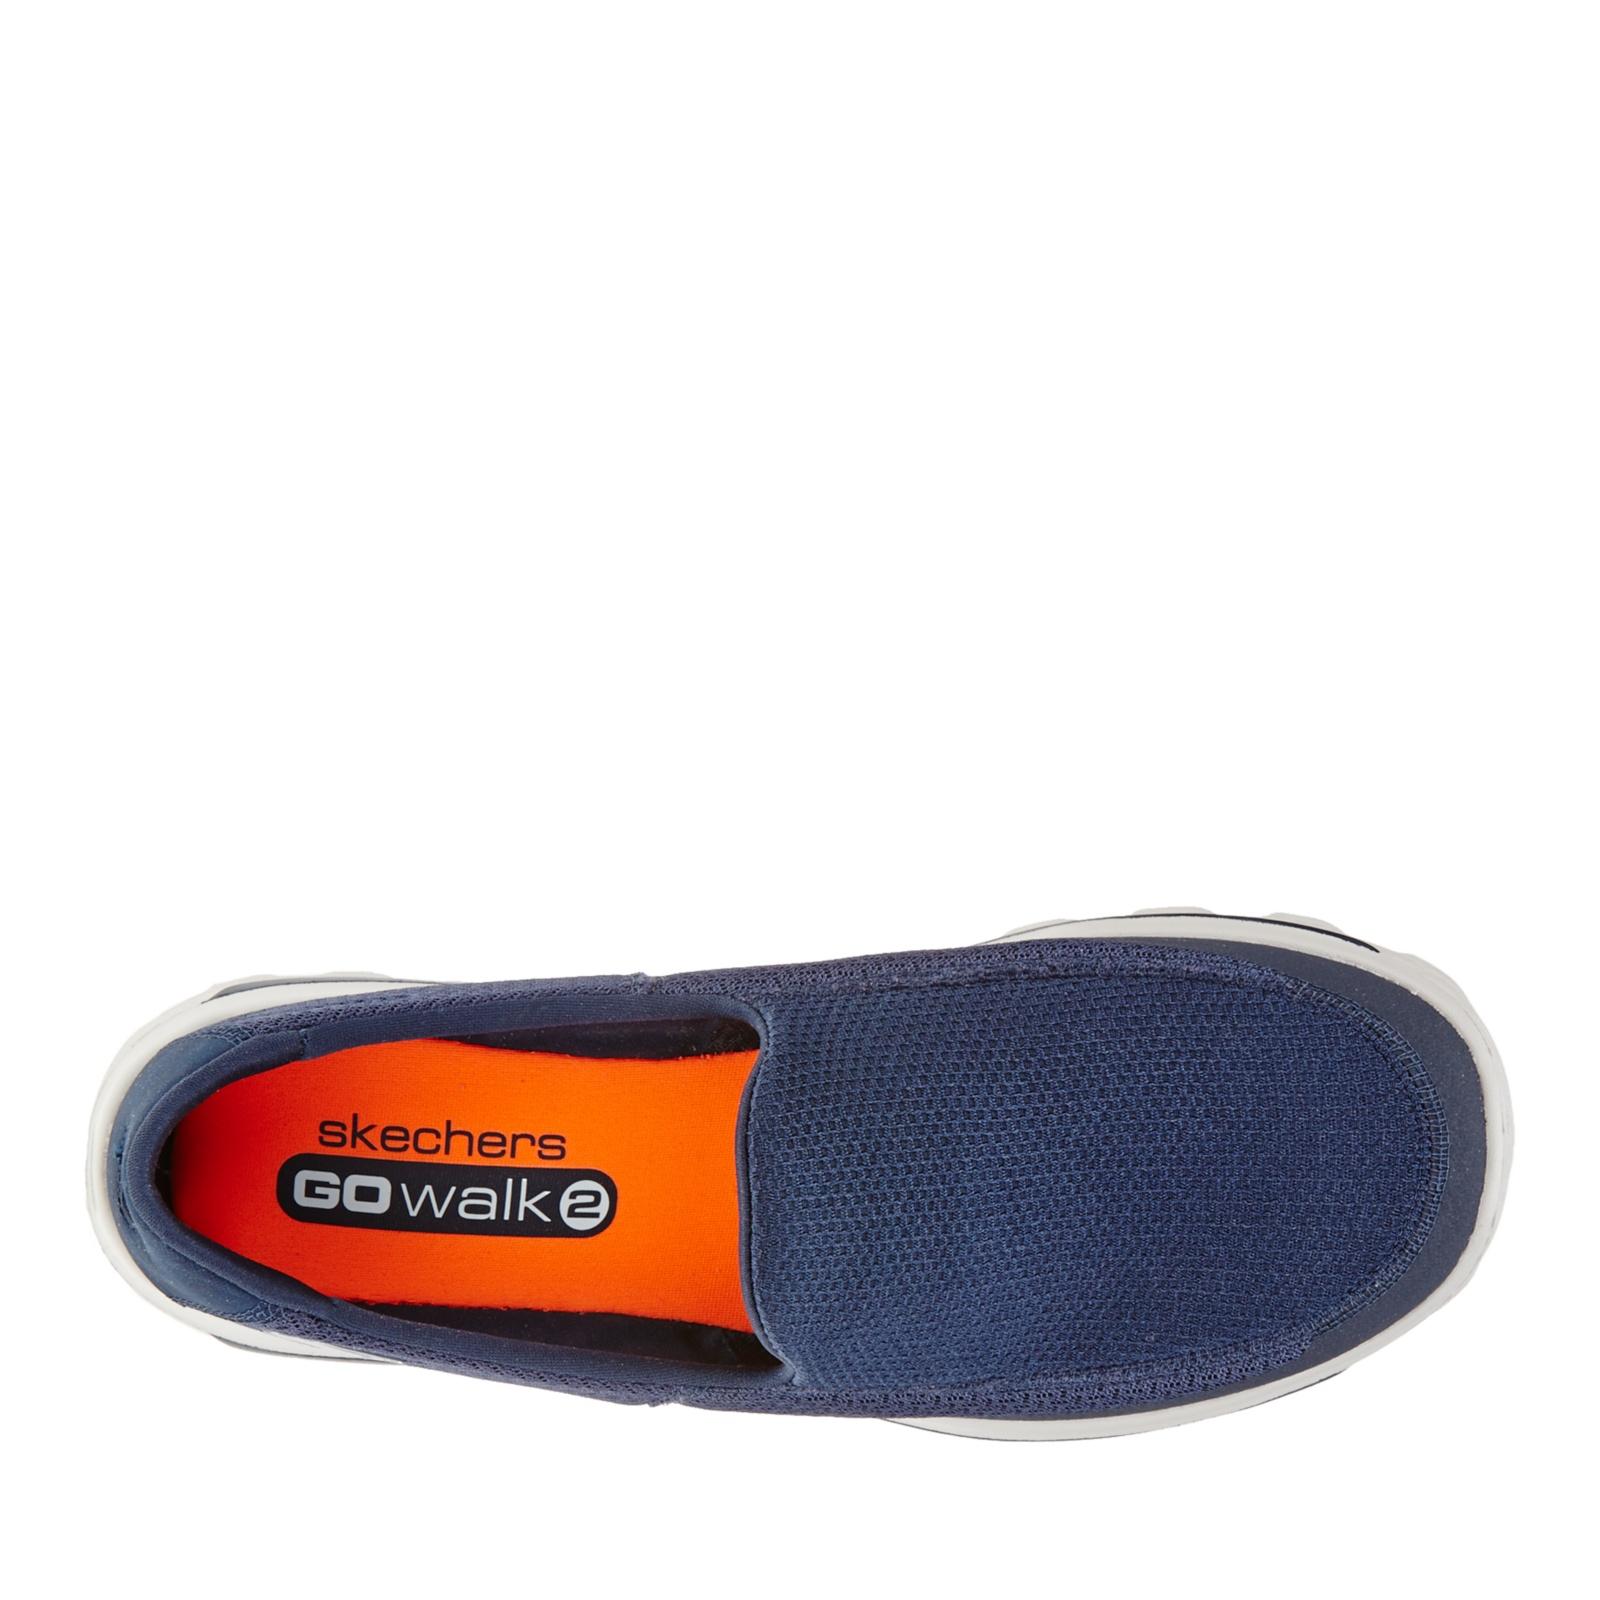 skechers mens gowalk 2 slip on sneaker shoes athletic